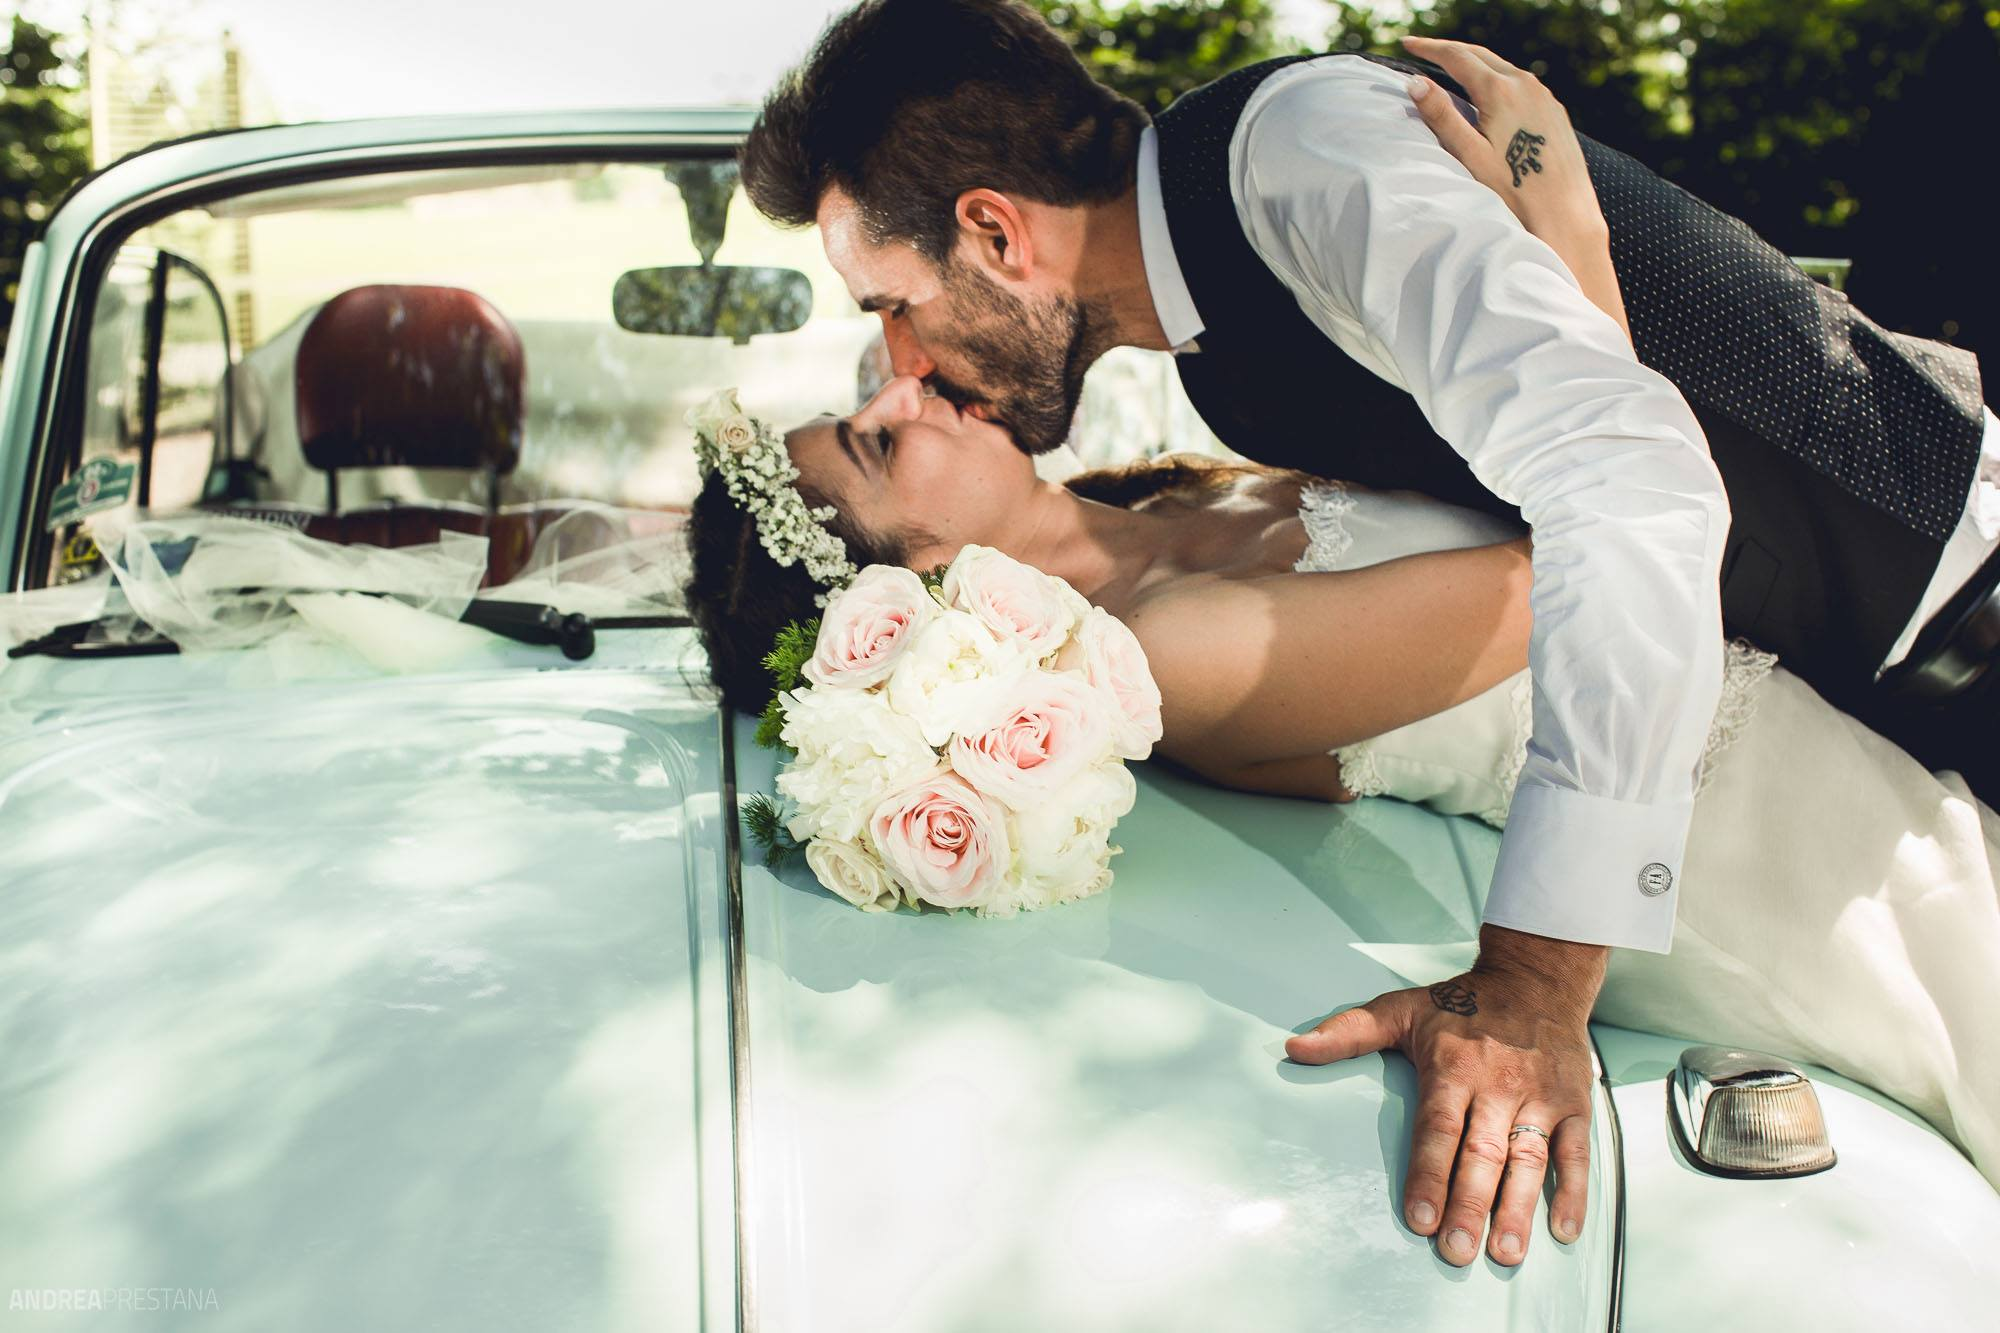 andrea prestana matrimonio